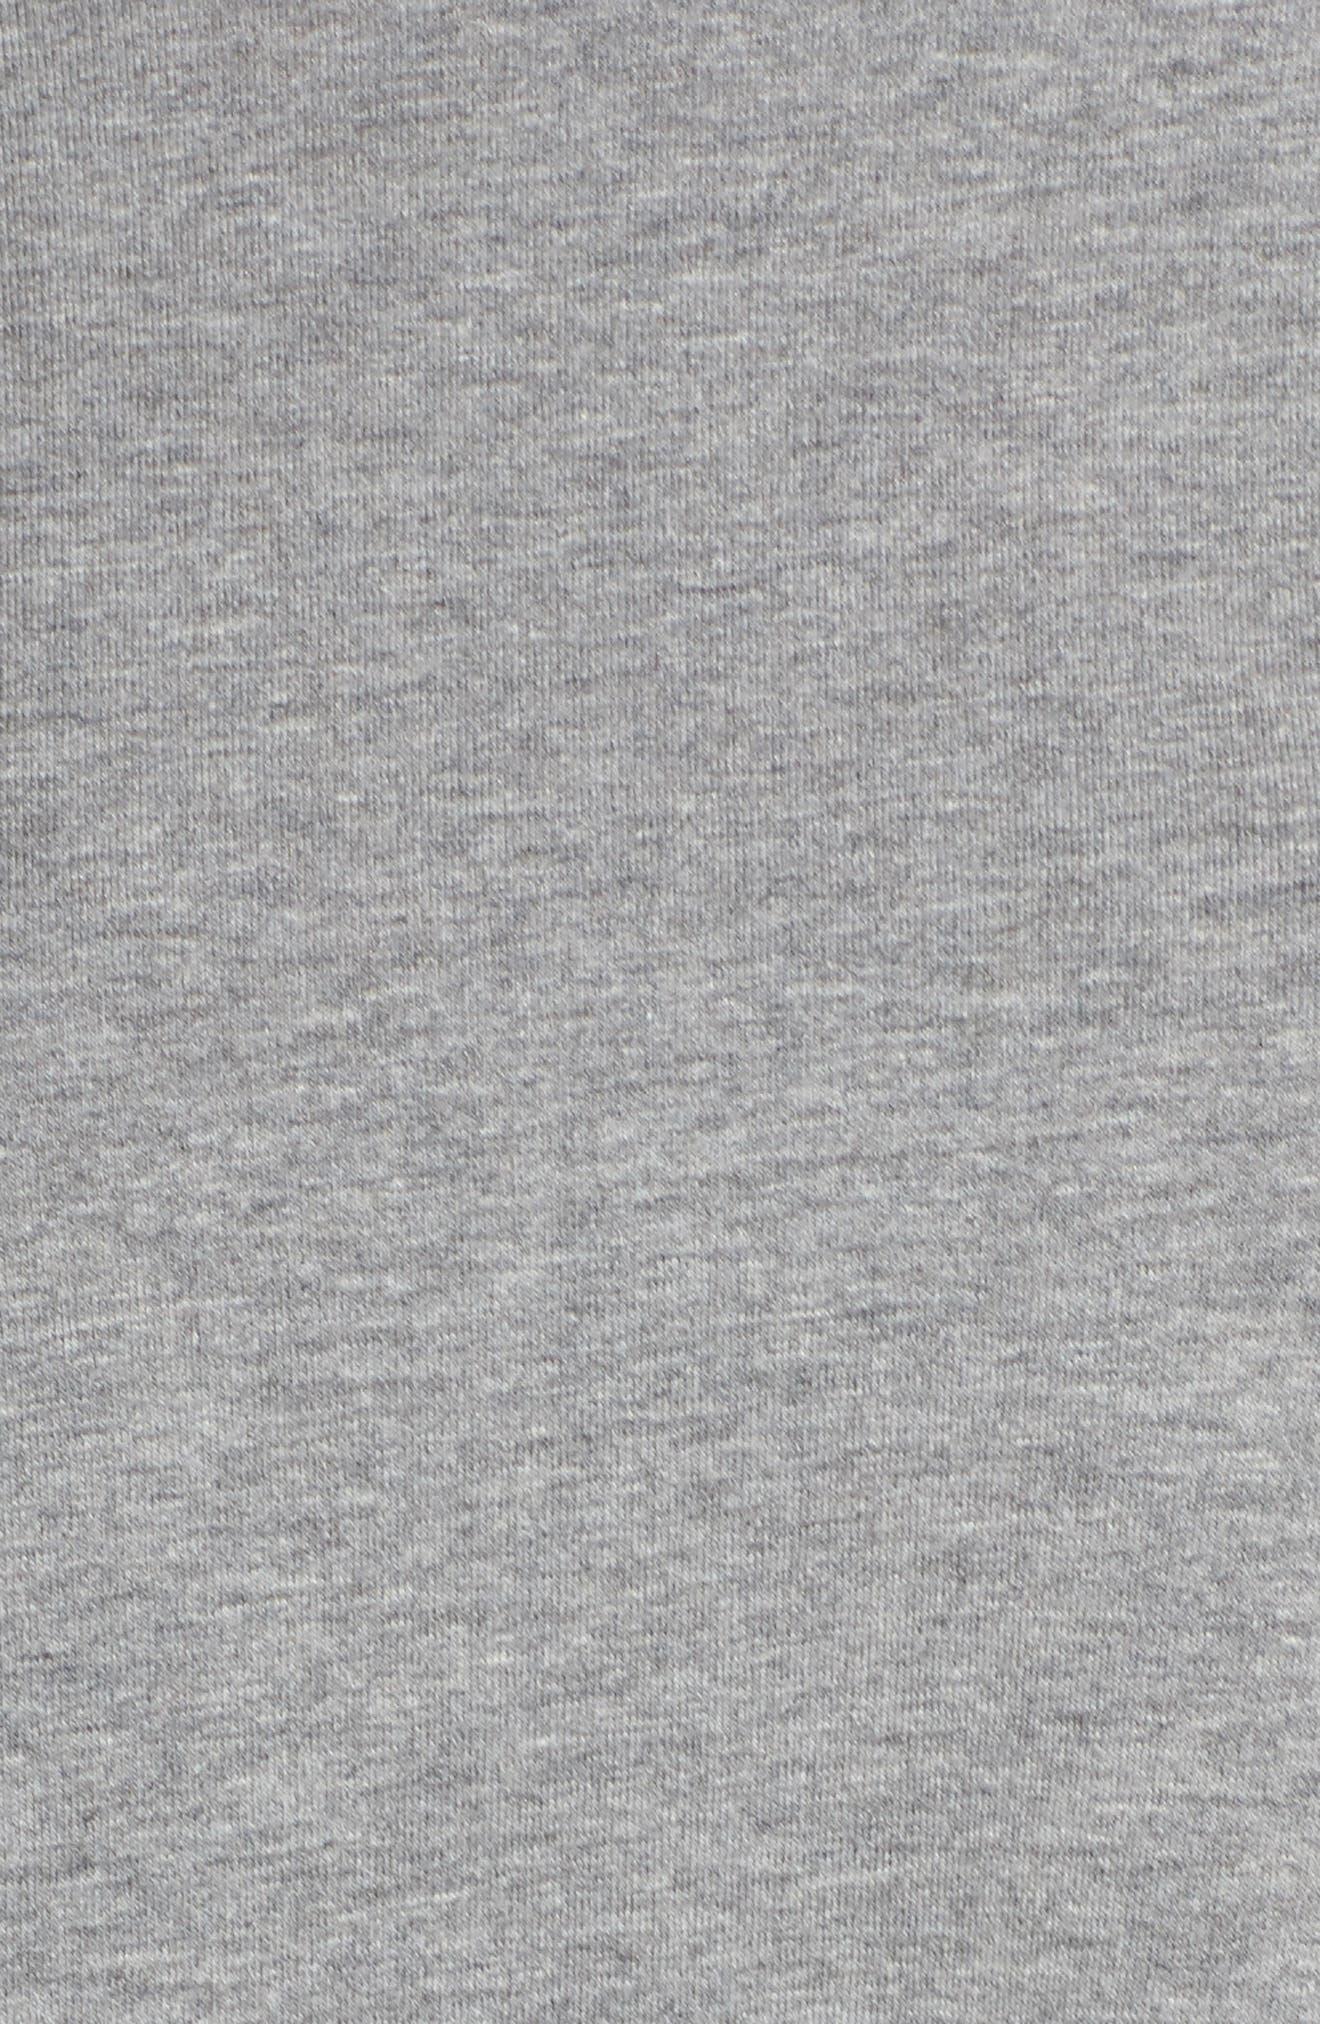 High/Low Sweatshirt,                             Alternate thumbnail 5, color,                             020